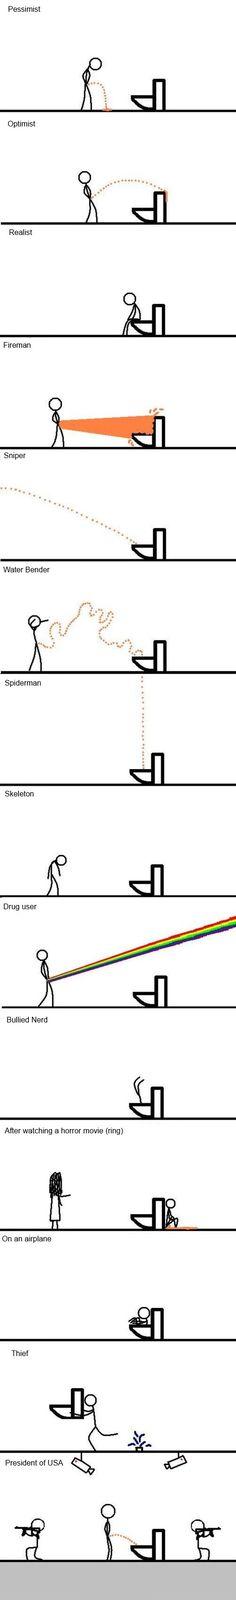 How people urinate